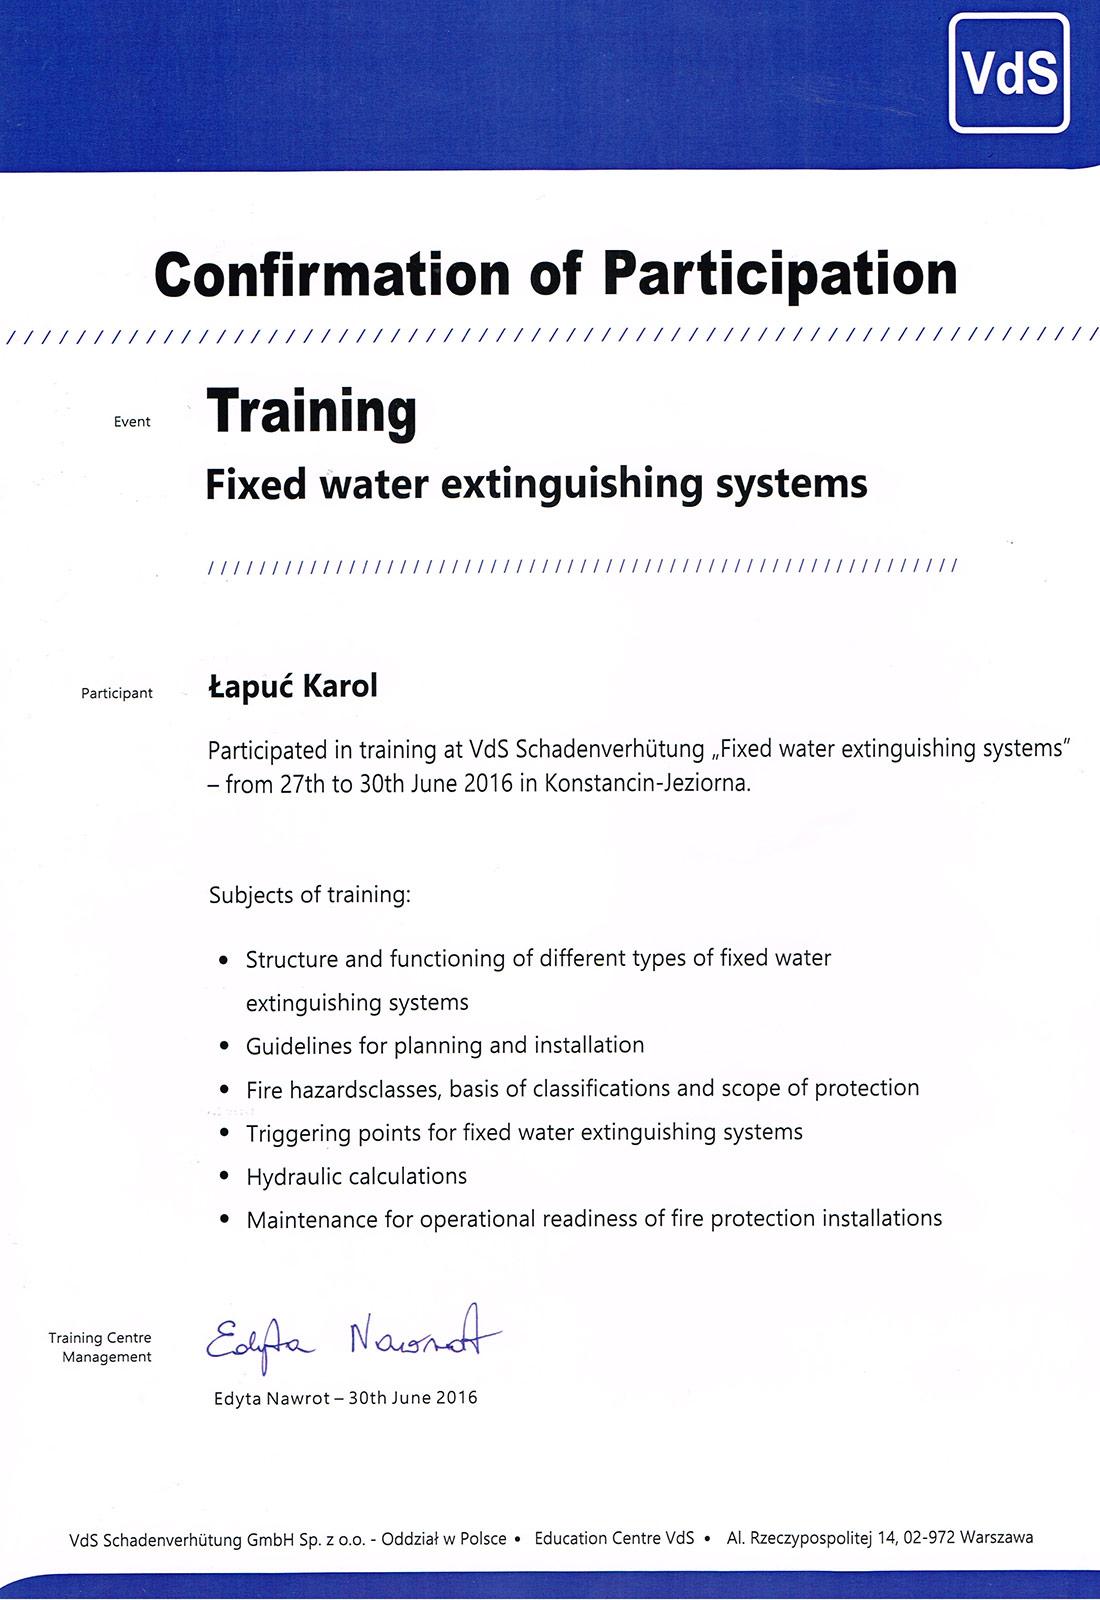 certyfikat_ccf20170110_0003_en